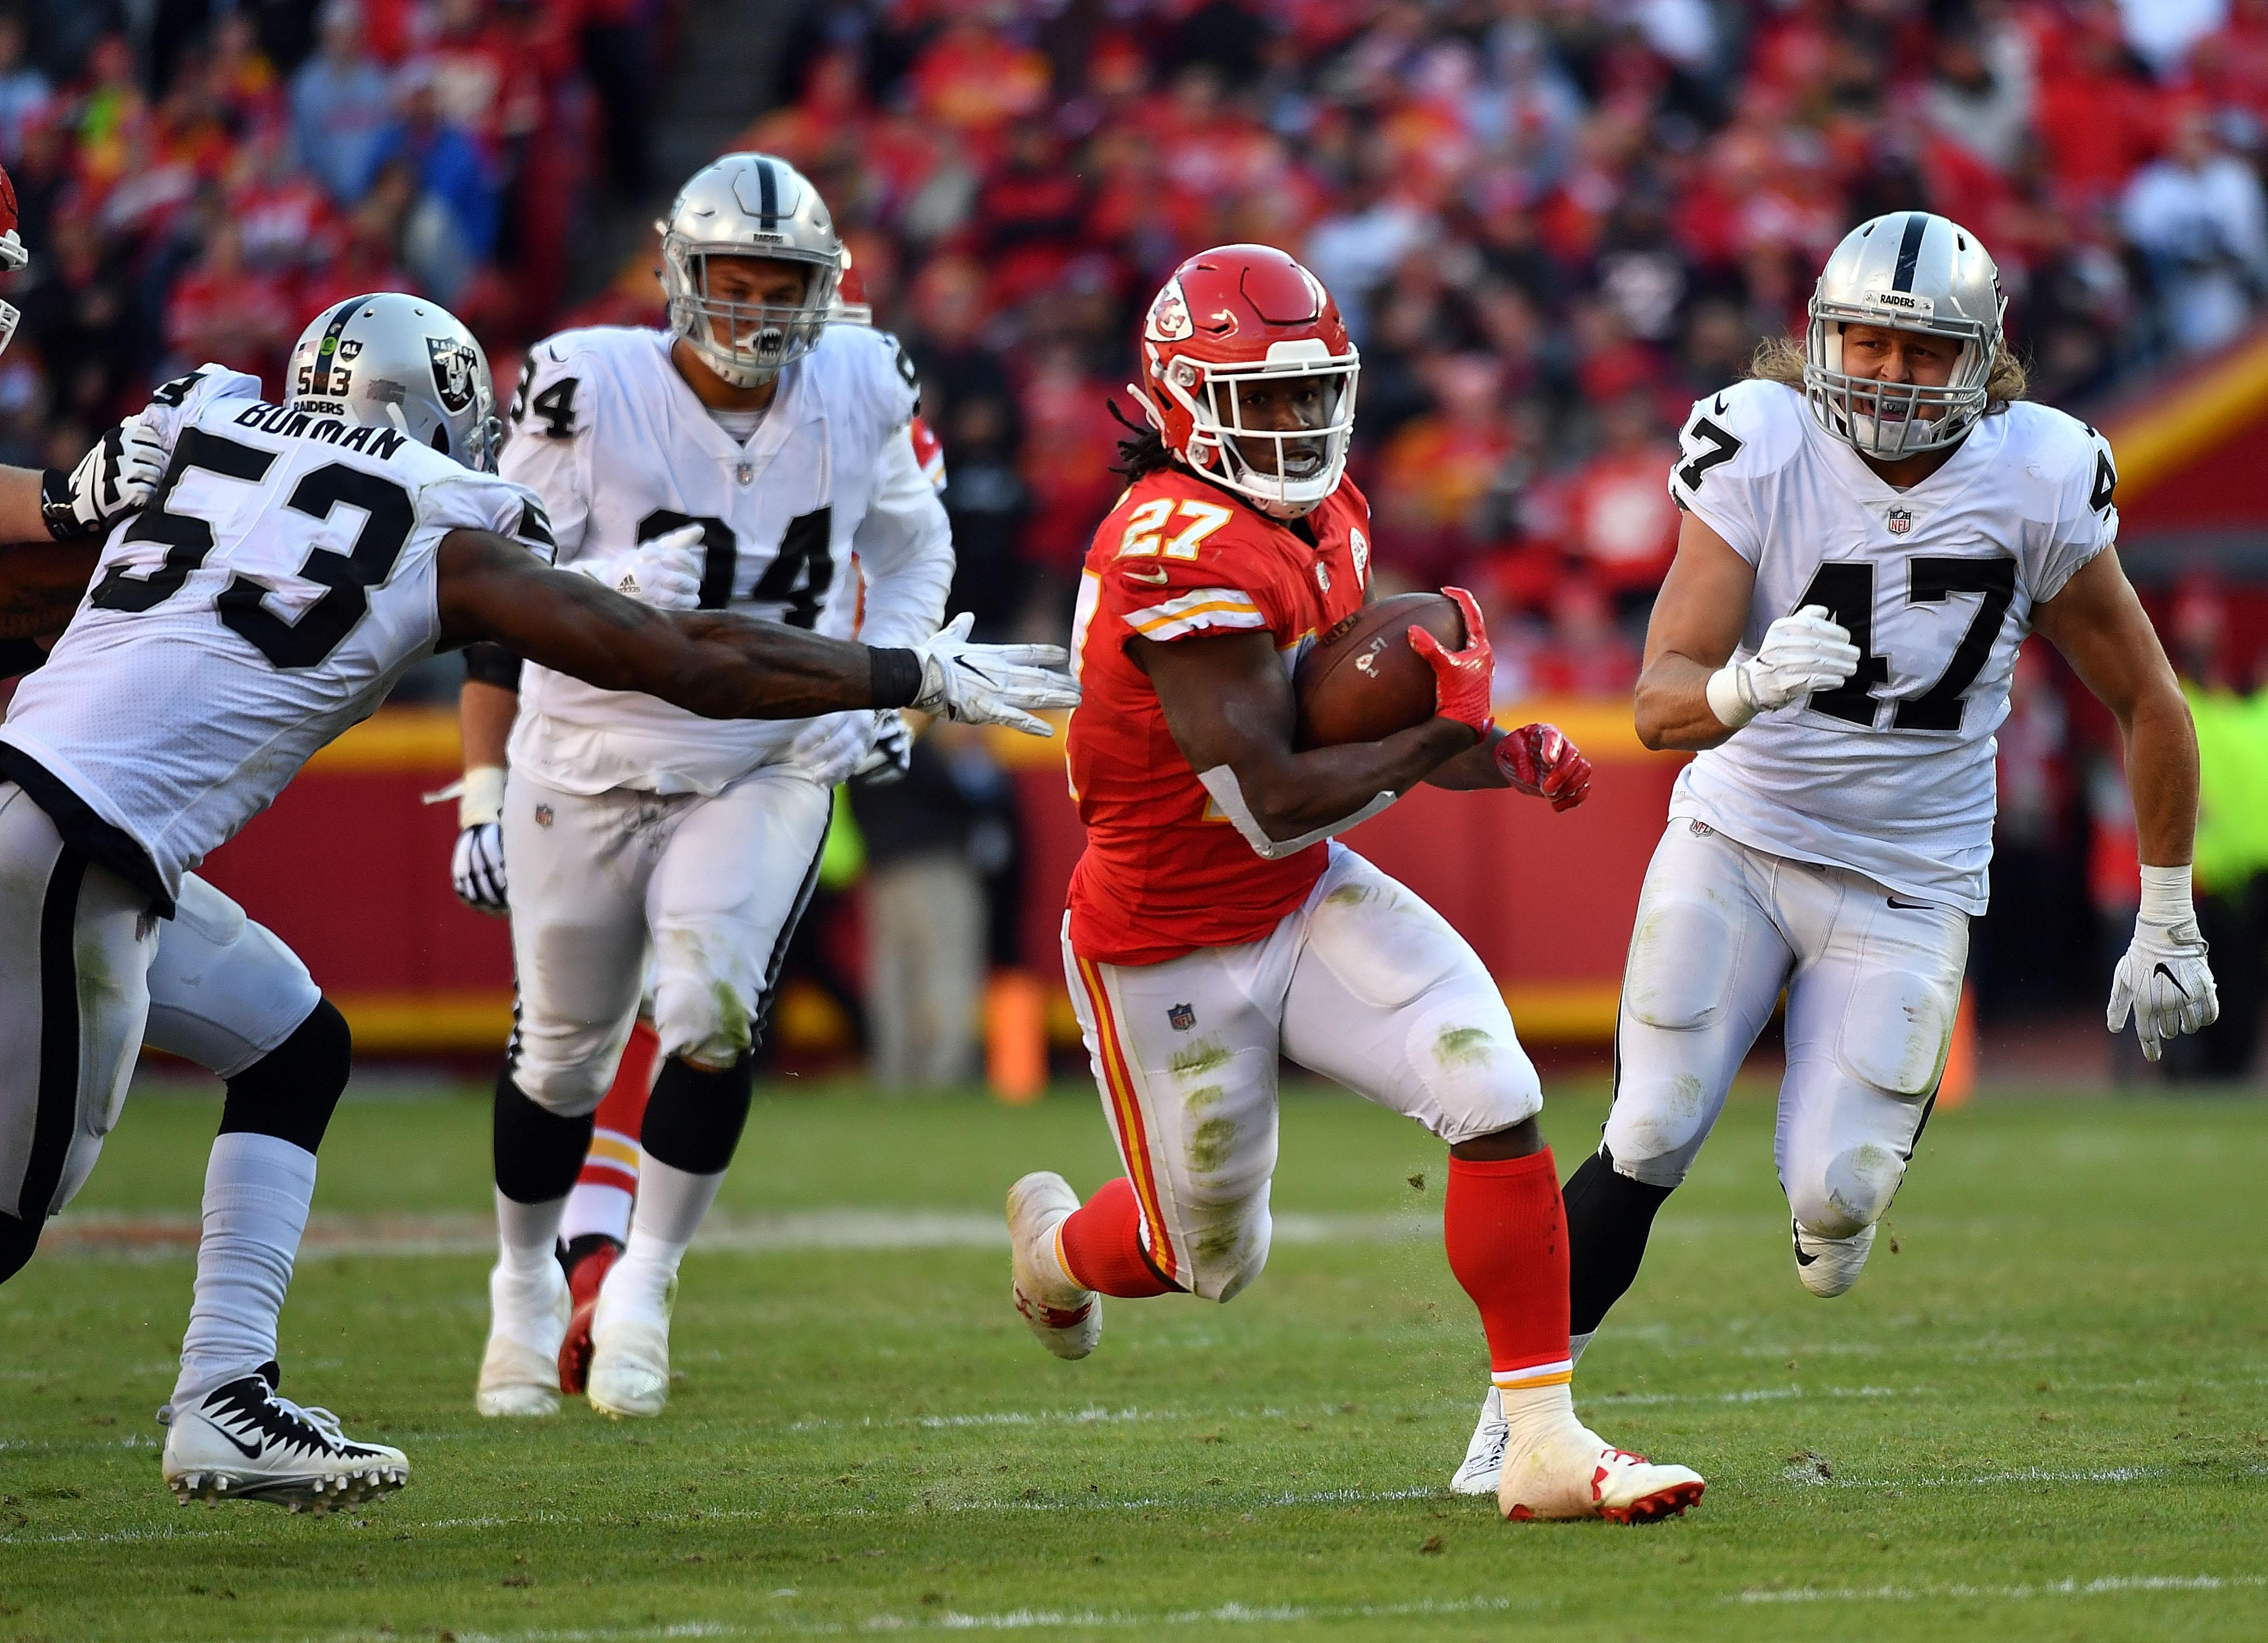 Horarios Semana 13 NFL 2018 Kansas Chiefs Los Angeles Rams